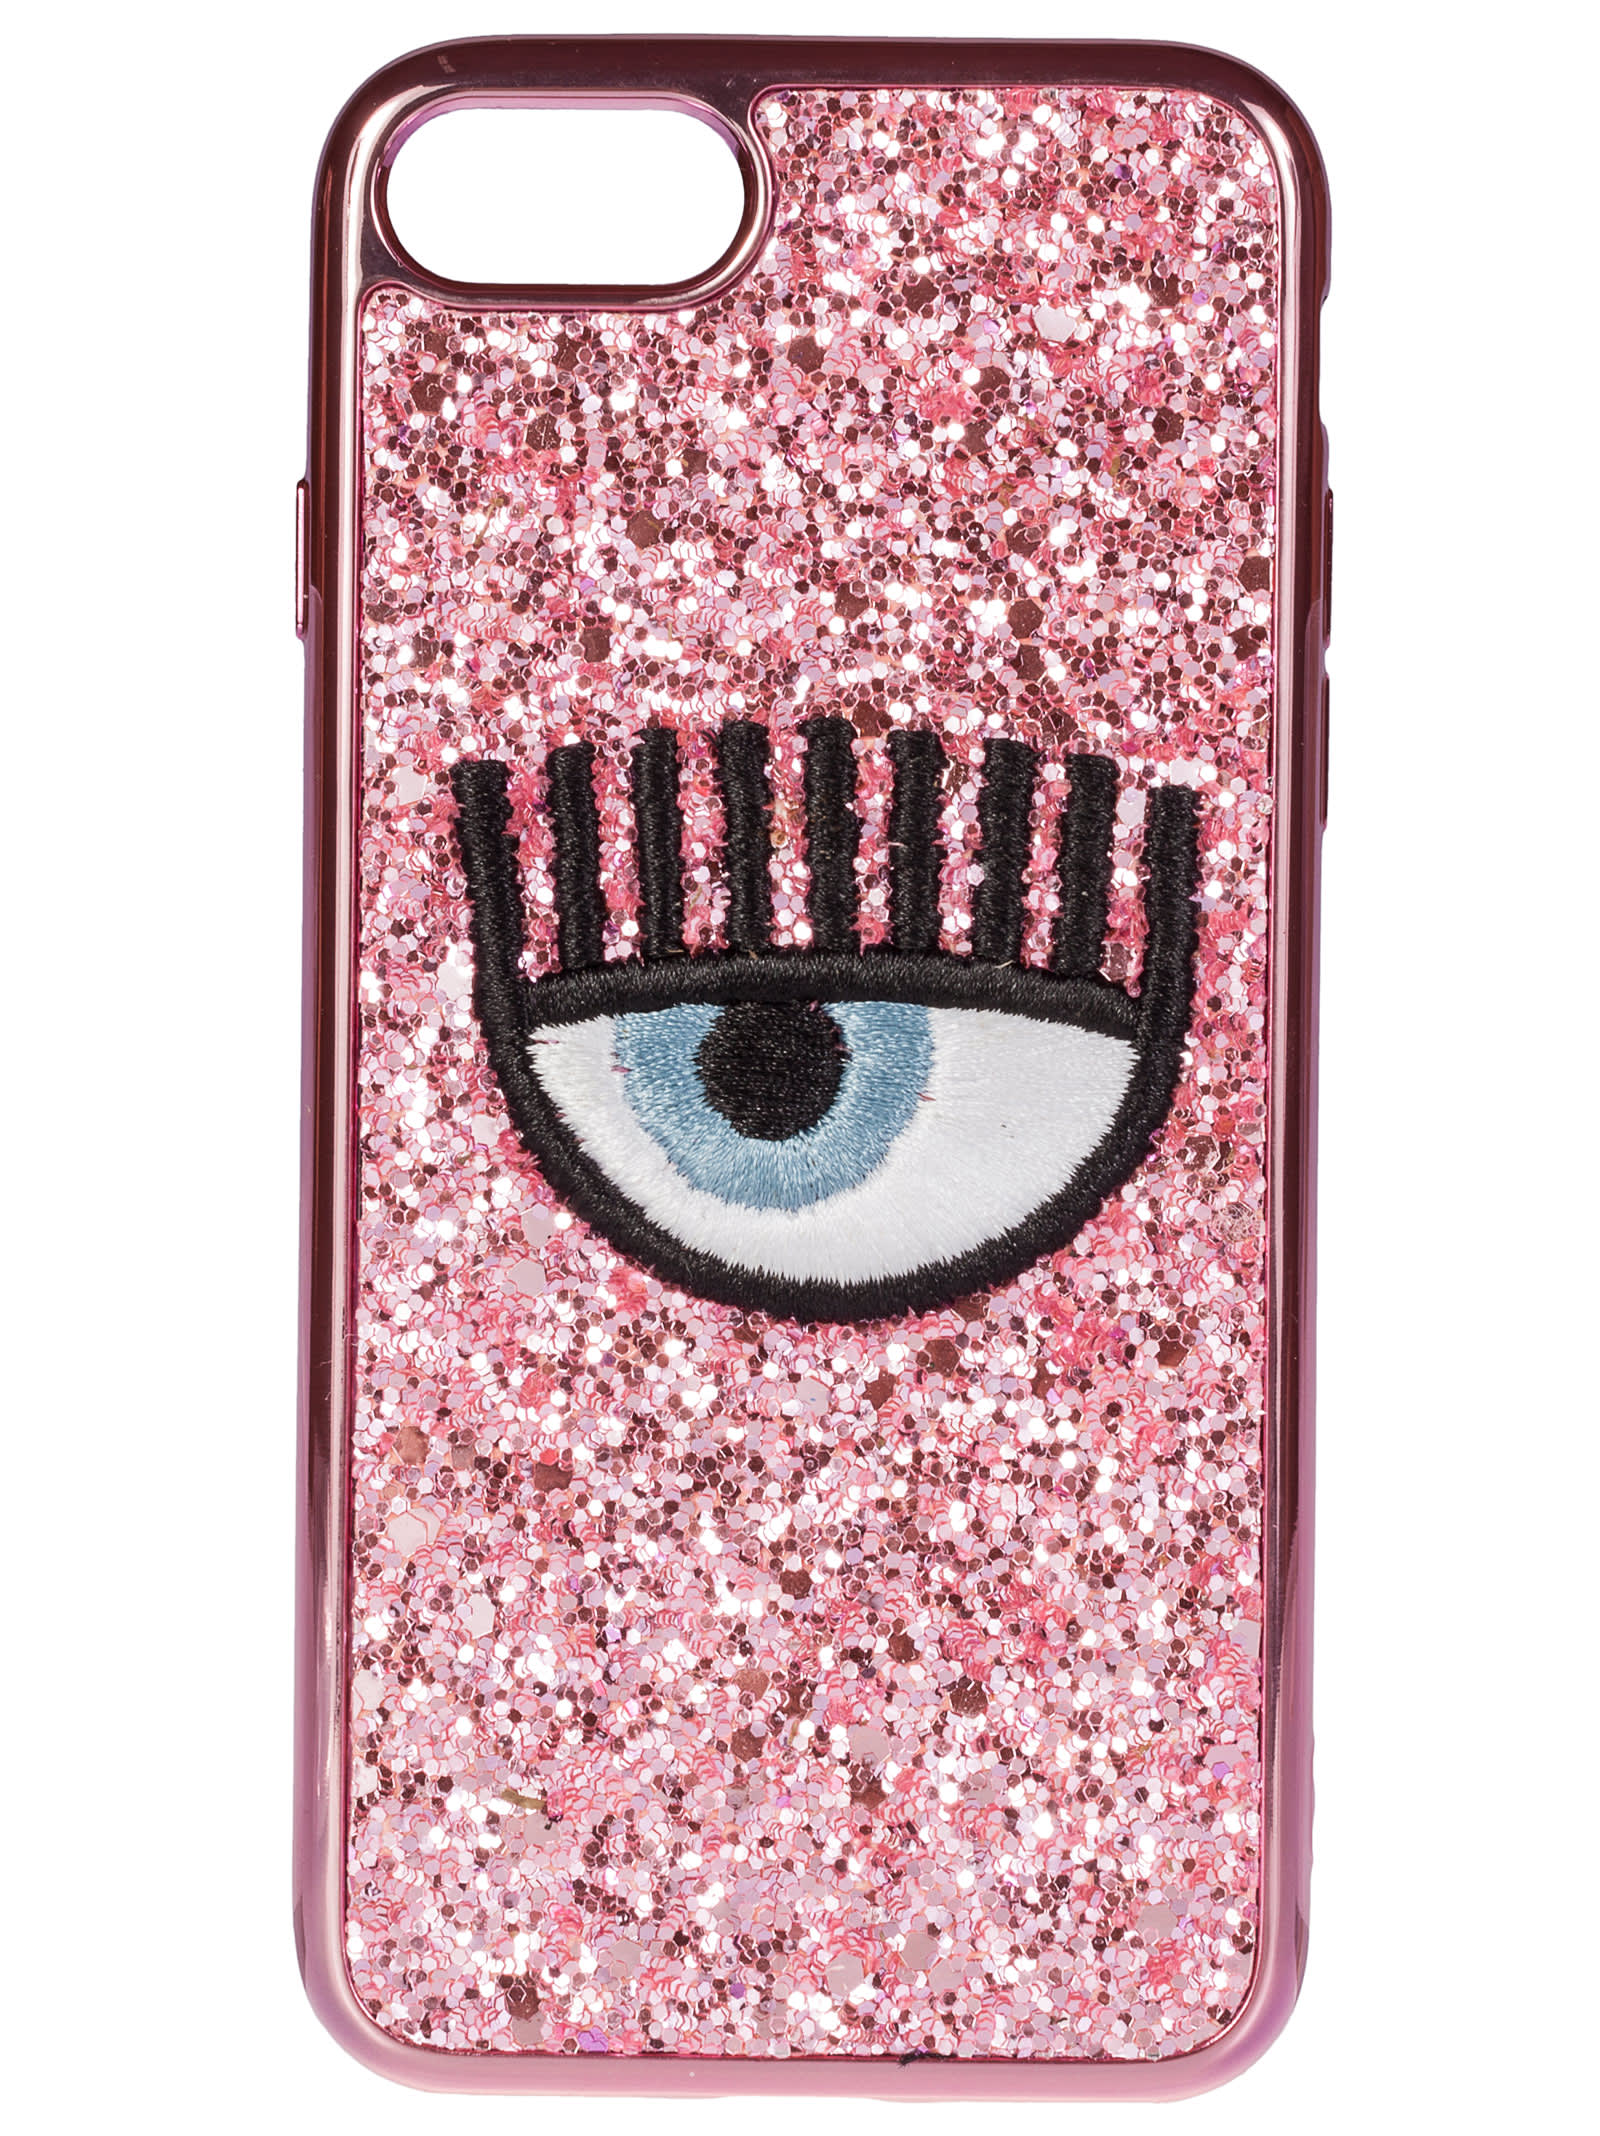 Chiara Ferragni Logo Iphone 7/8 Case